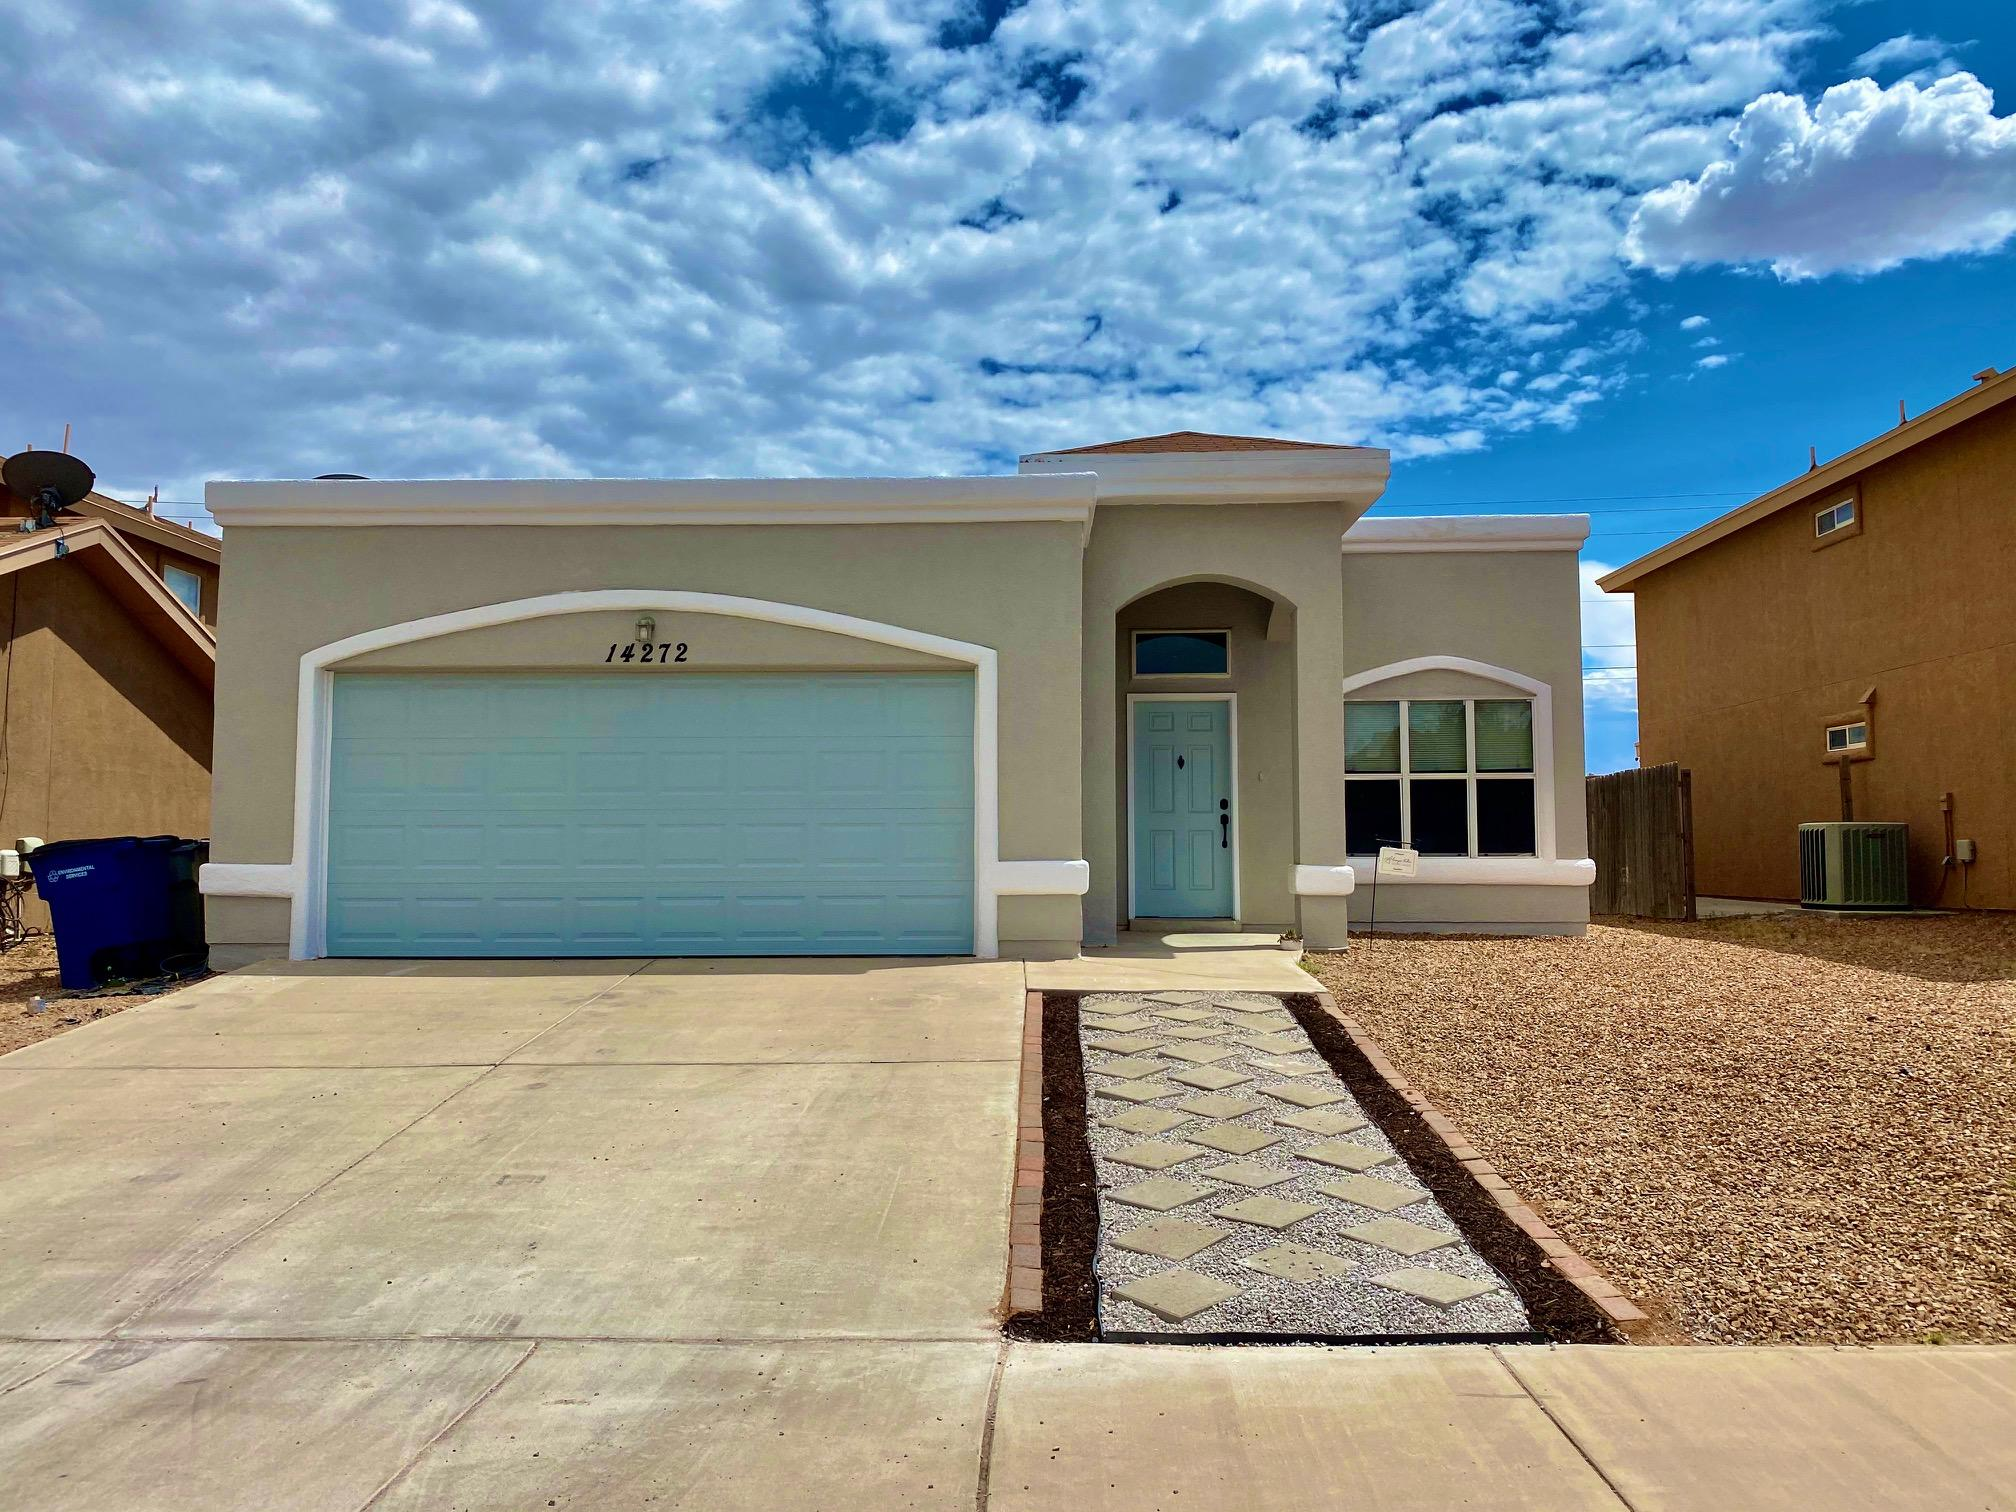 14272 FIREWOOD Drive, El Paso, Texas 79938, 3 Bedrooms Bedrooms, ,2 BathroomsBathrooms,Residential Rental,For Rent,FIREWOOD,835949